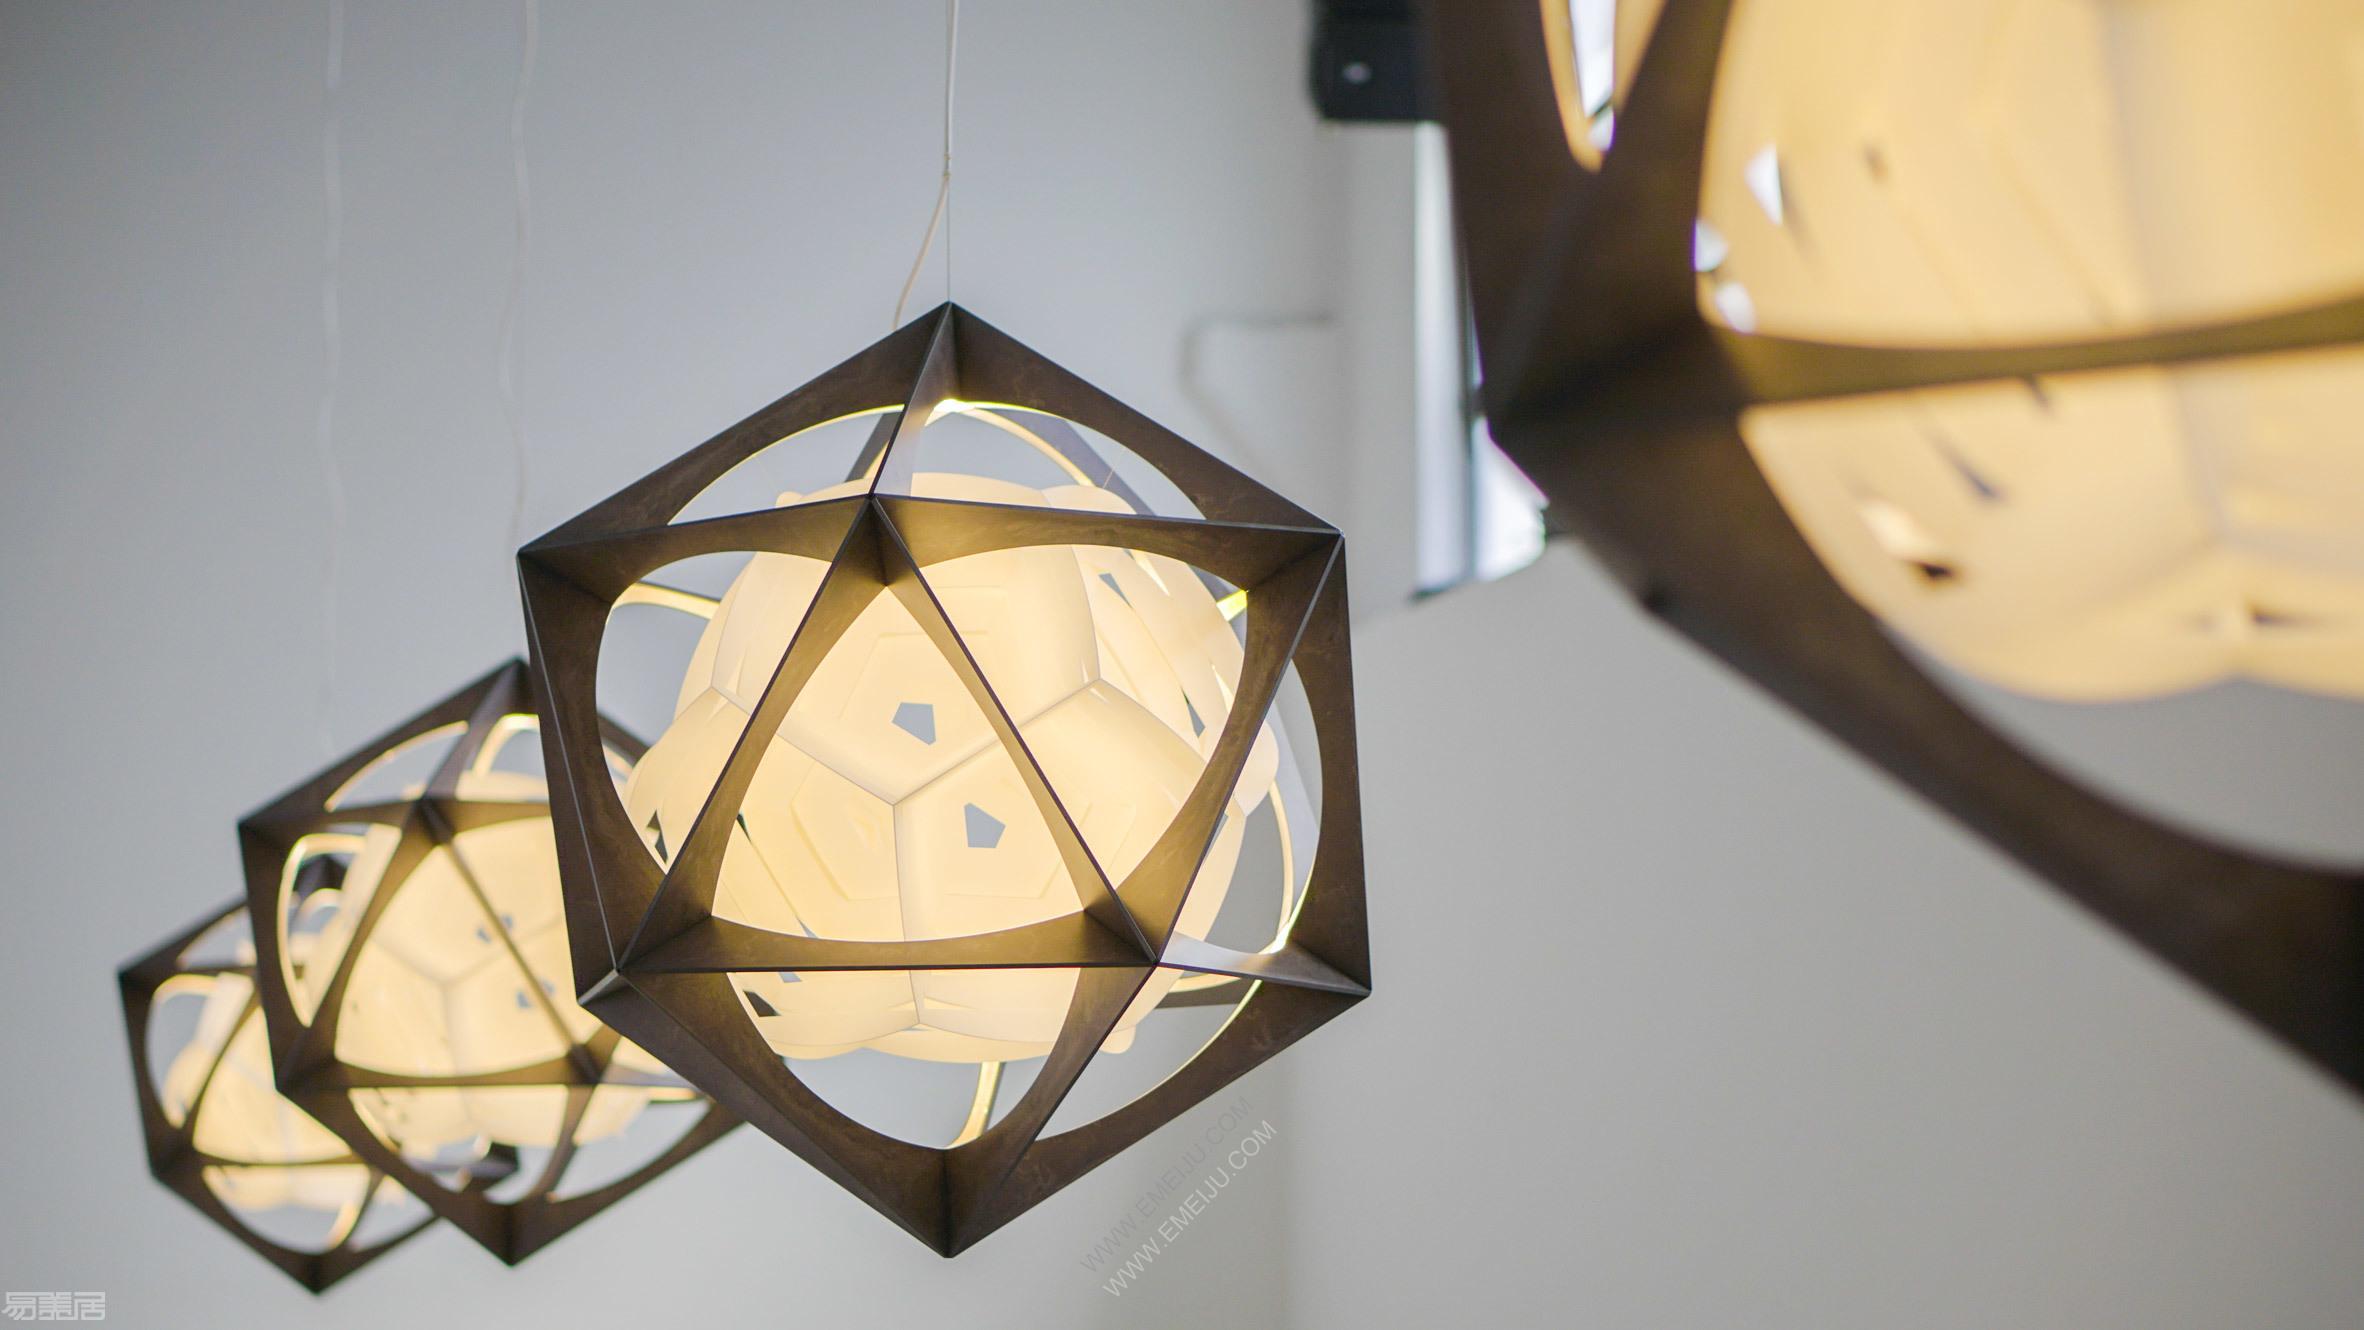 euroluce-lighting-milan-design-week-2019_dezeen_2364_col_9.jpg